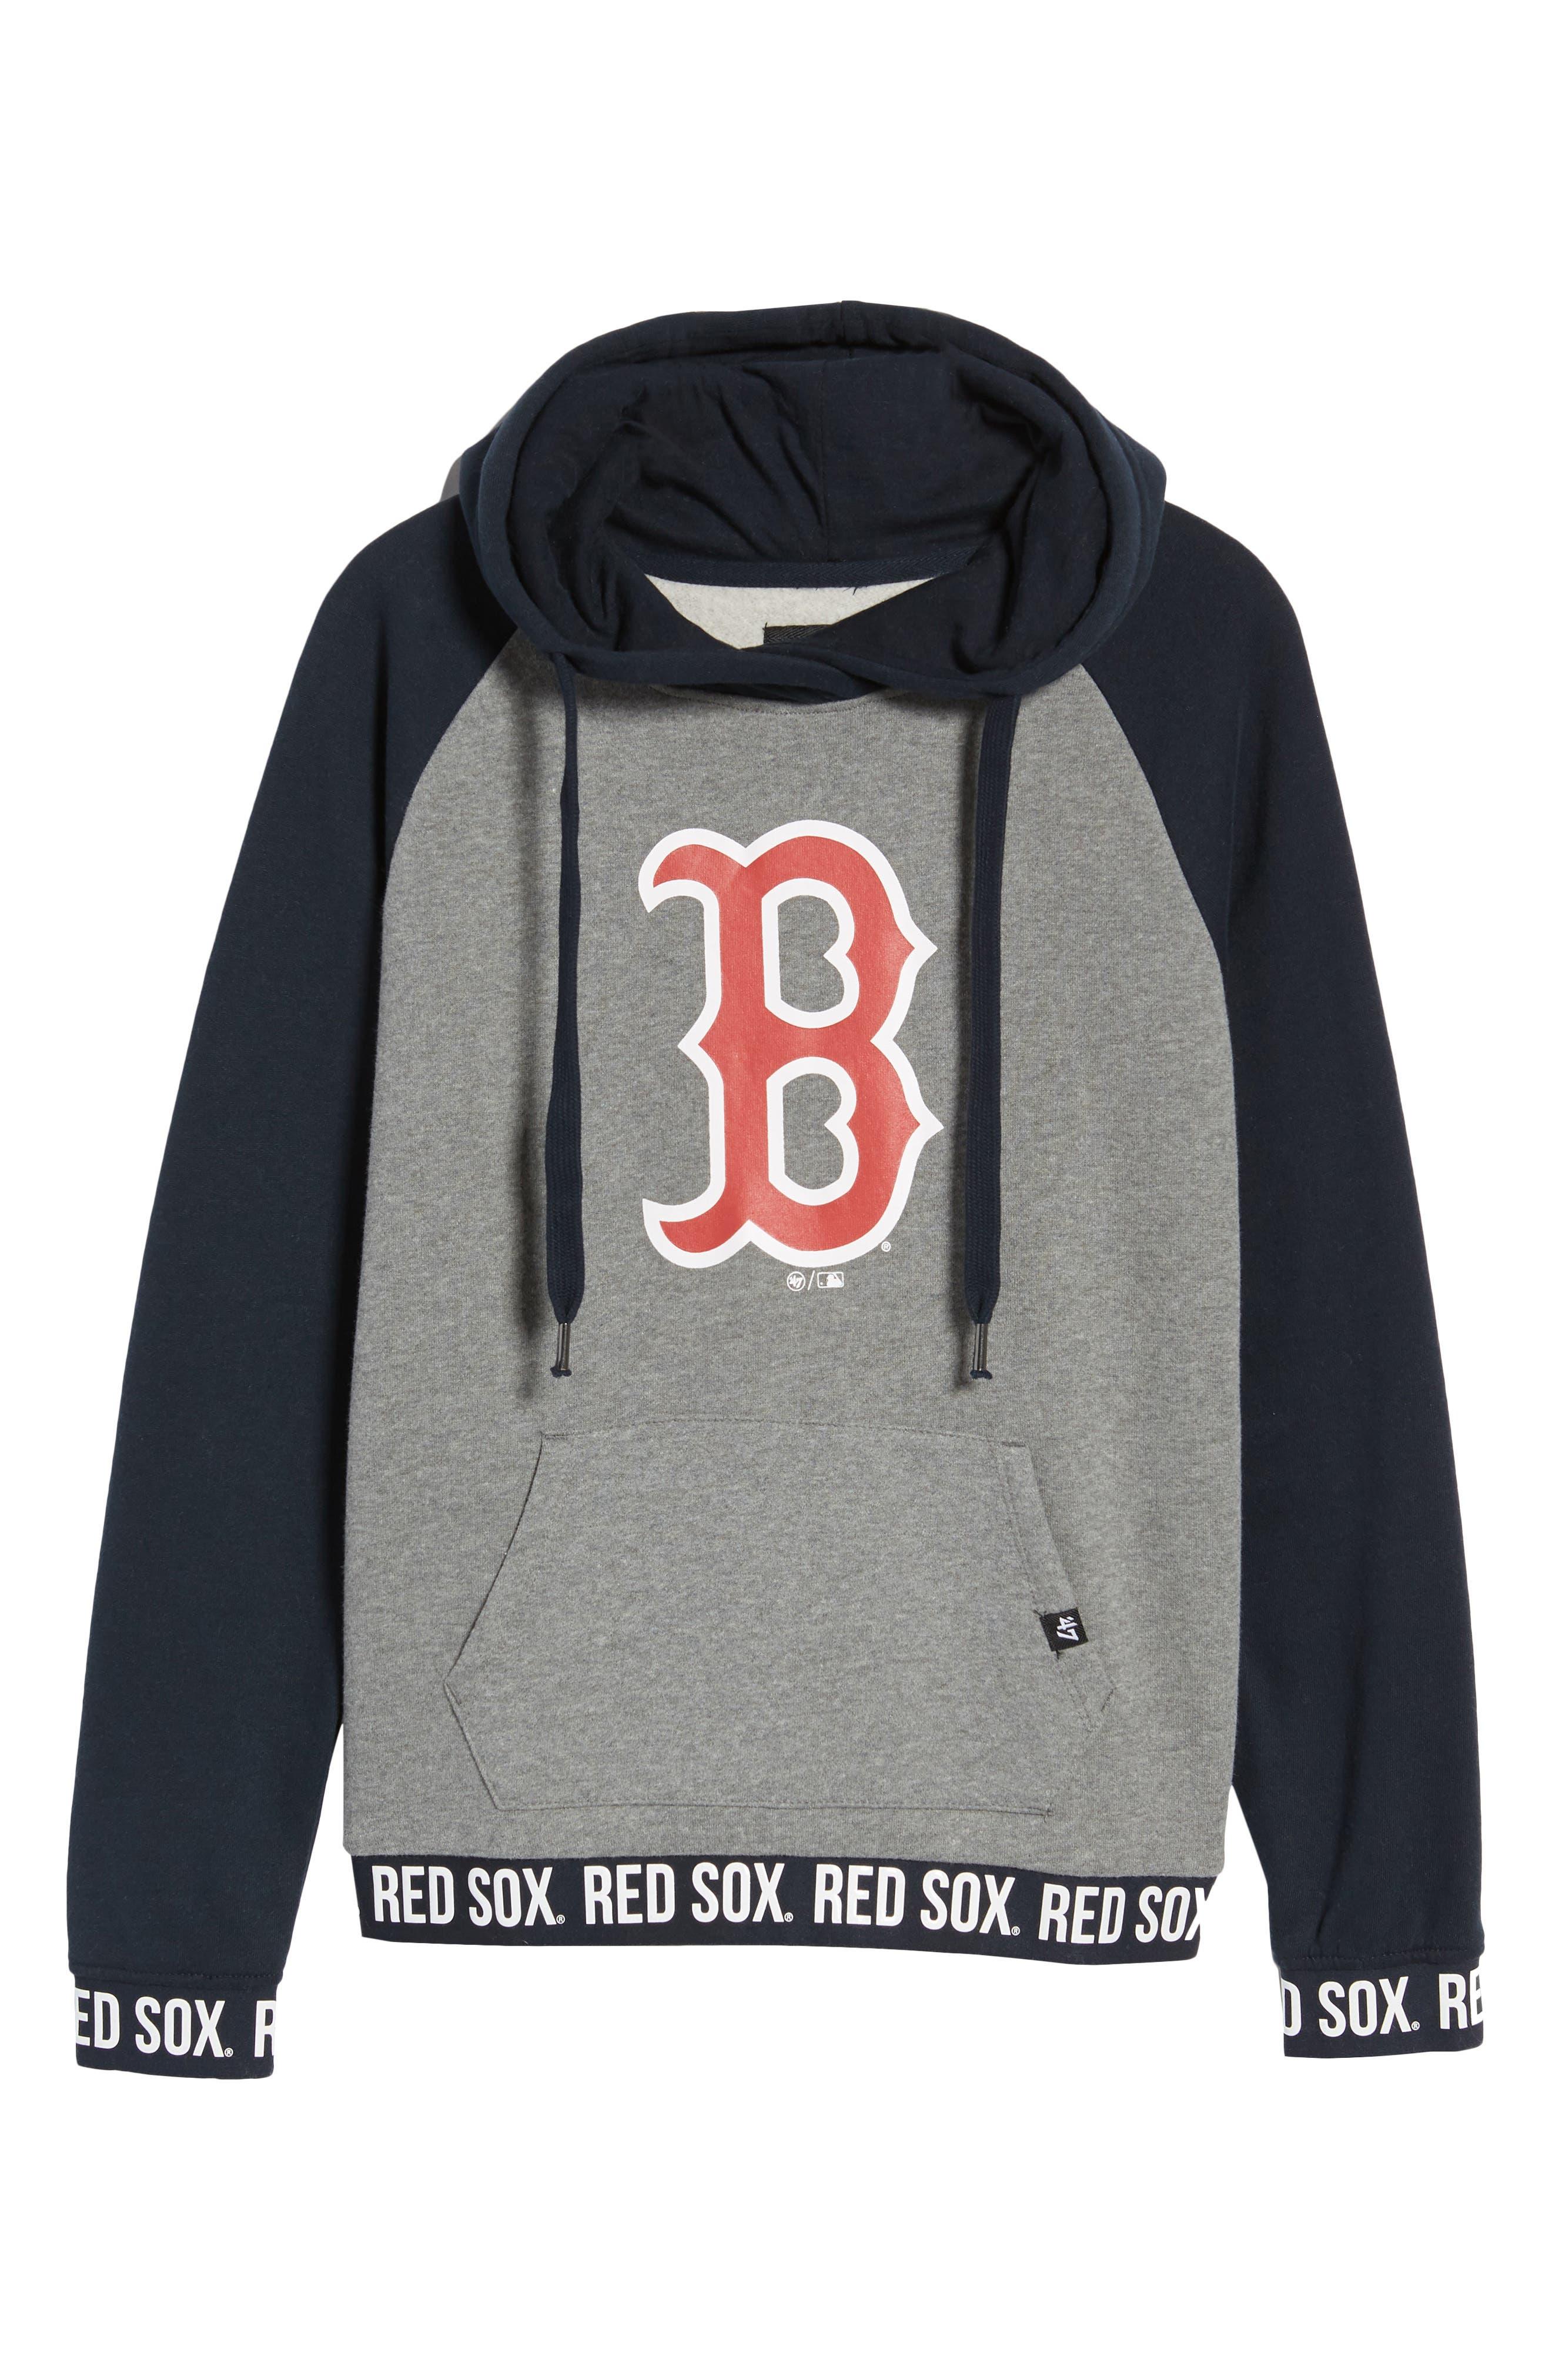 Encore Revolve Boston Red Sox Hoodie,                             Alternate thumbnail 7, color,                             Vintage Grey